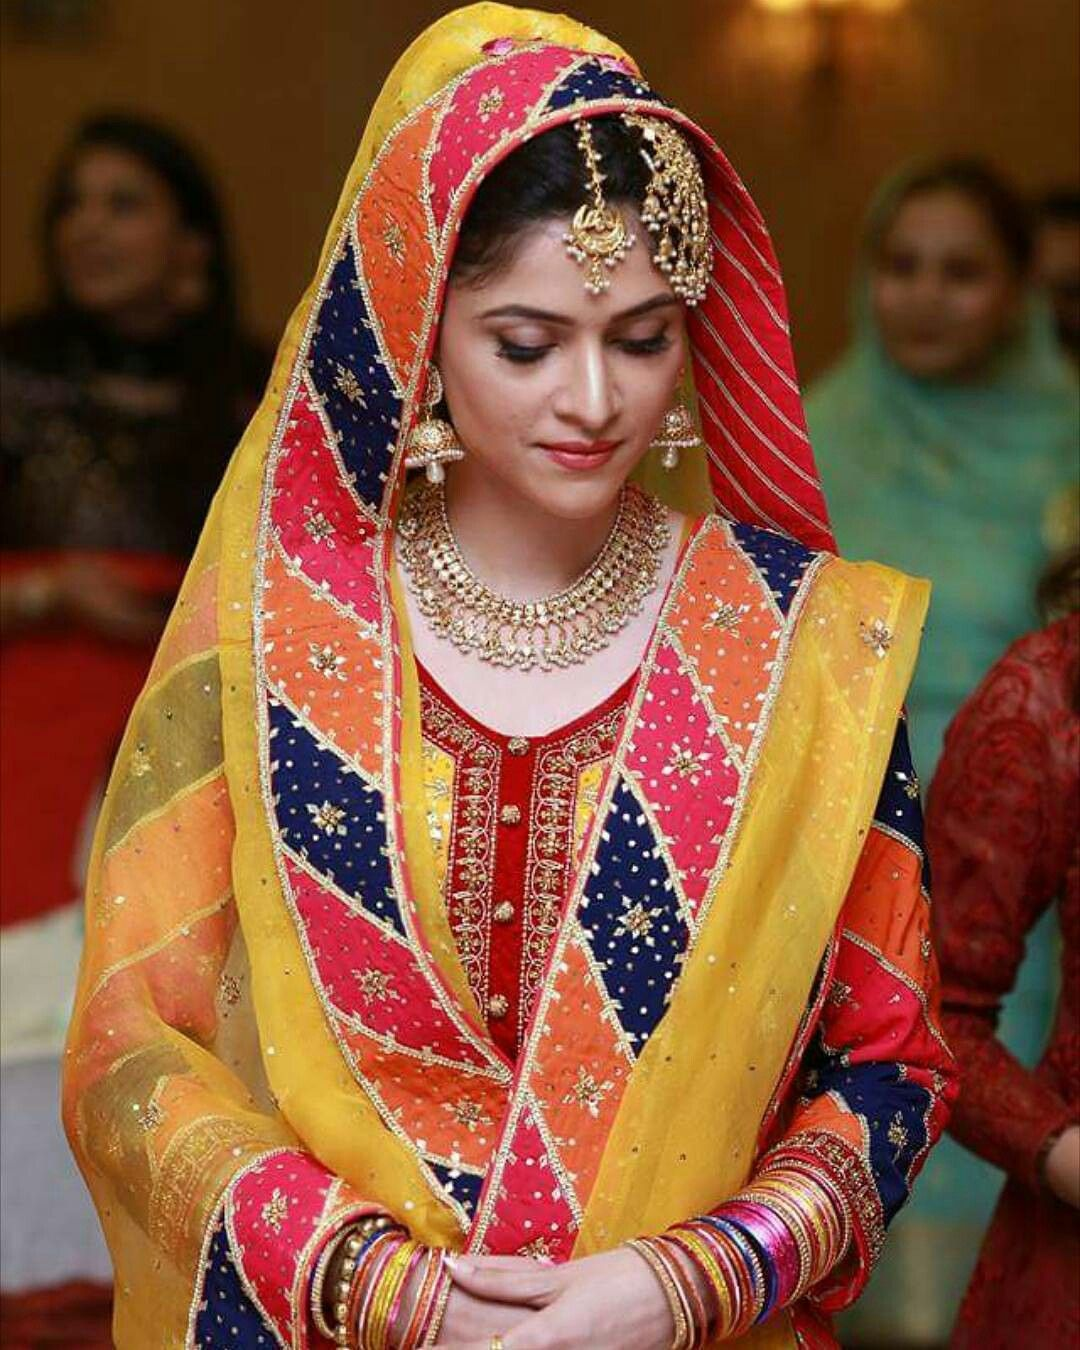 Fromnav jivan brides and bridal pinterest mehndi outfit